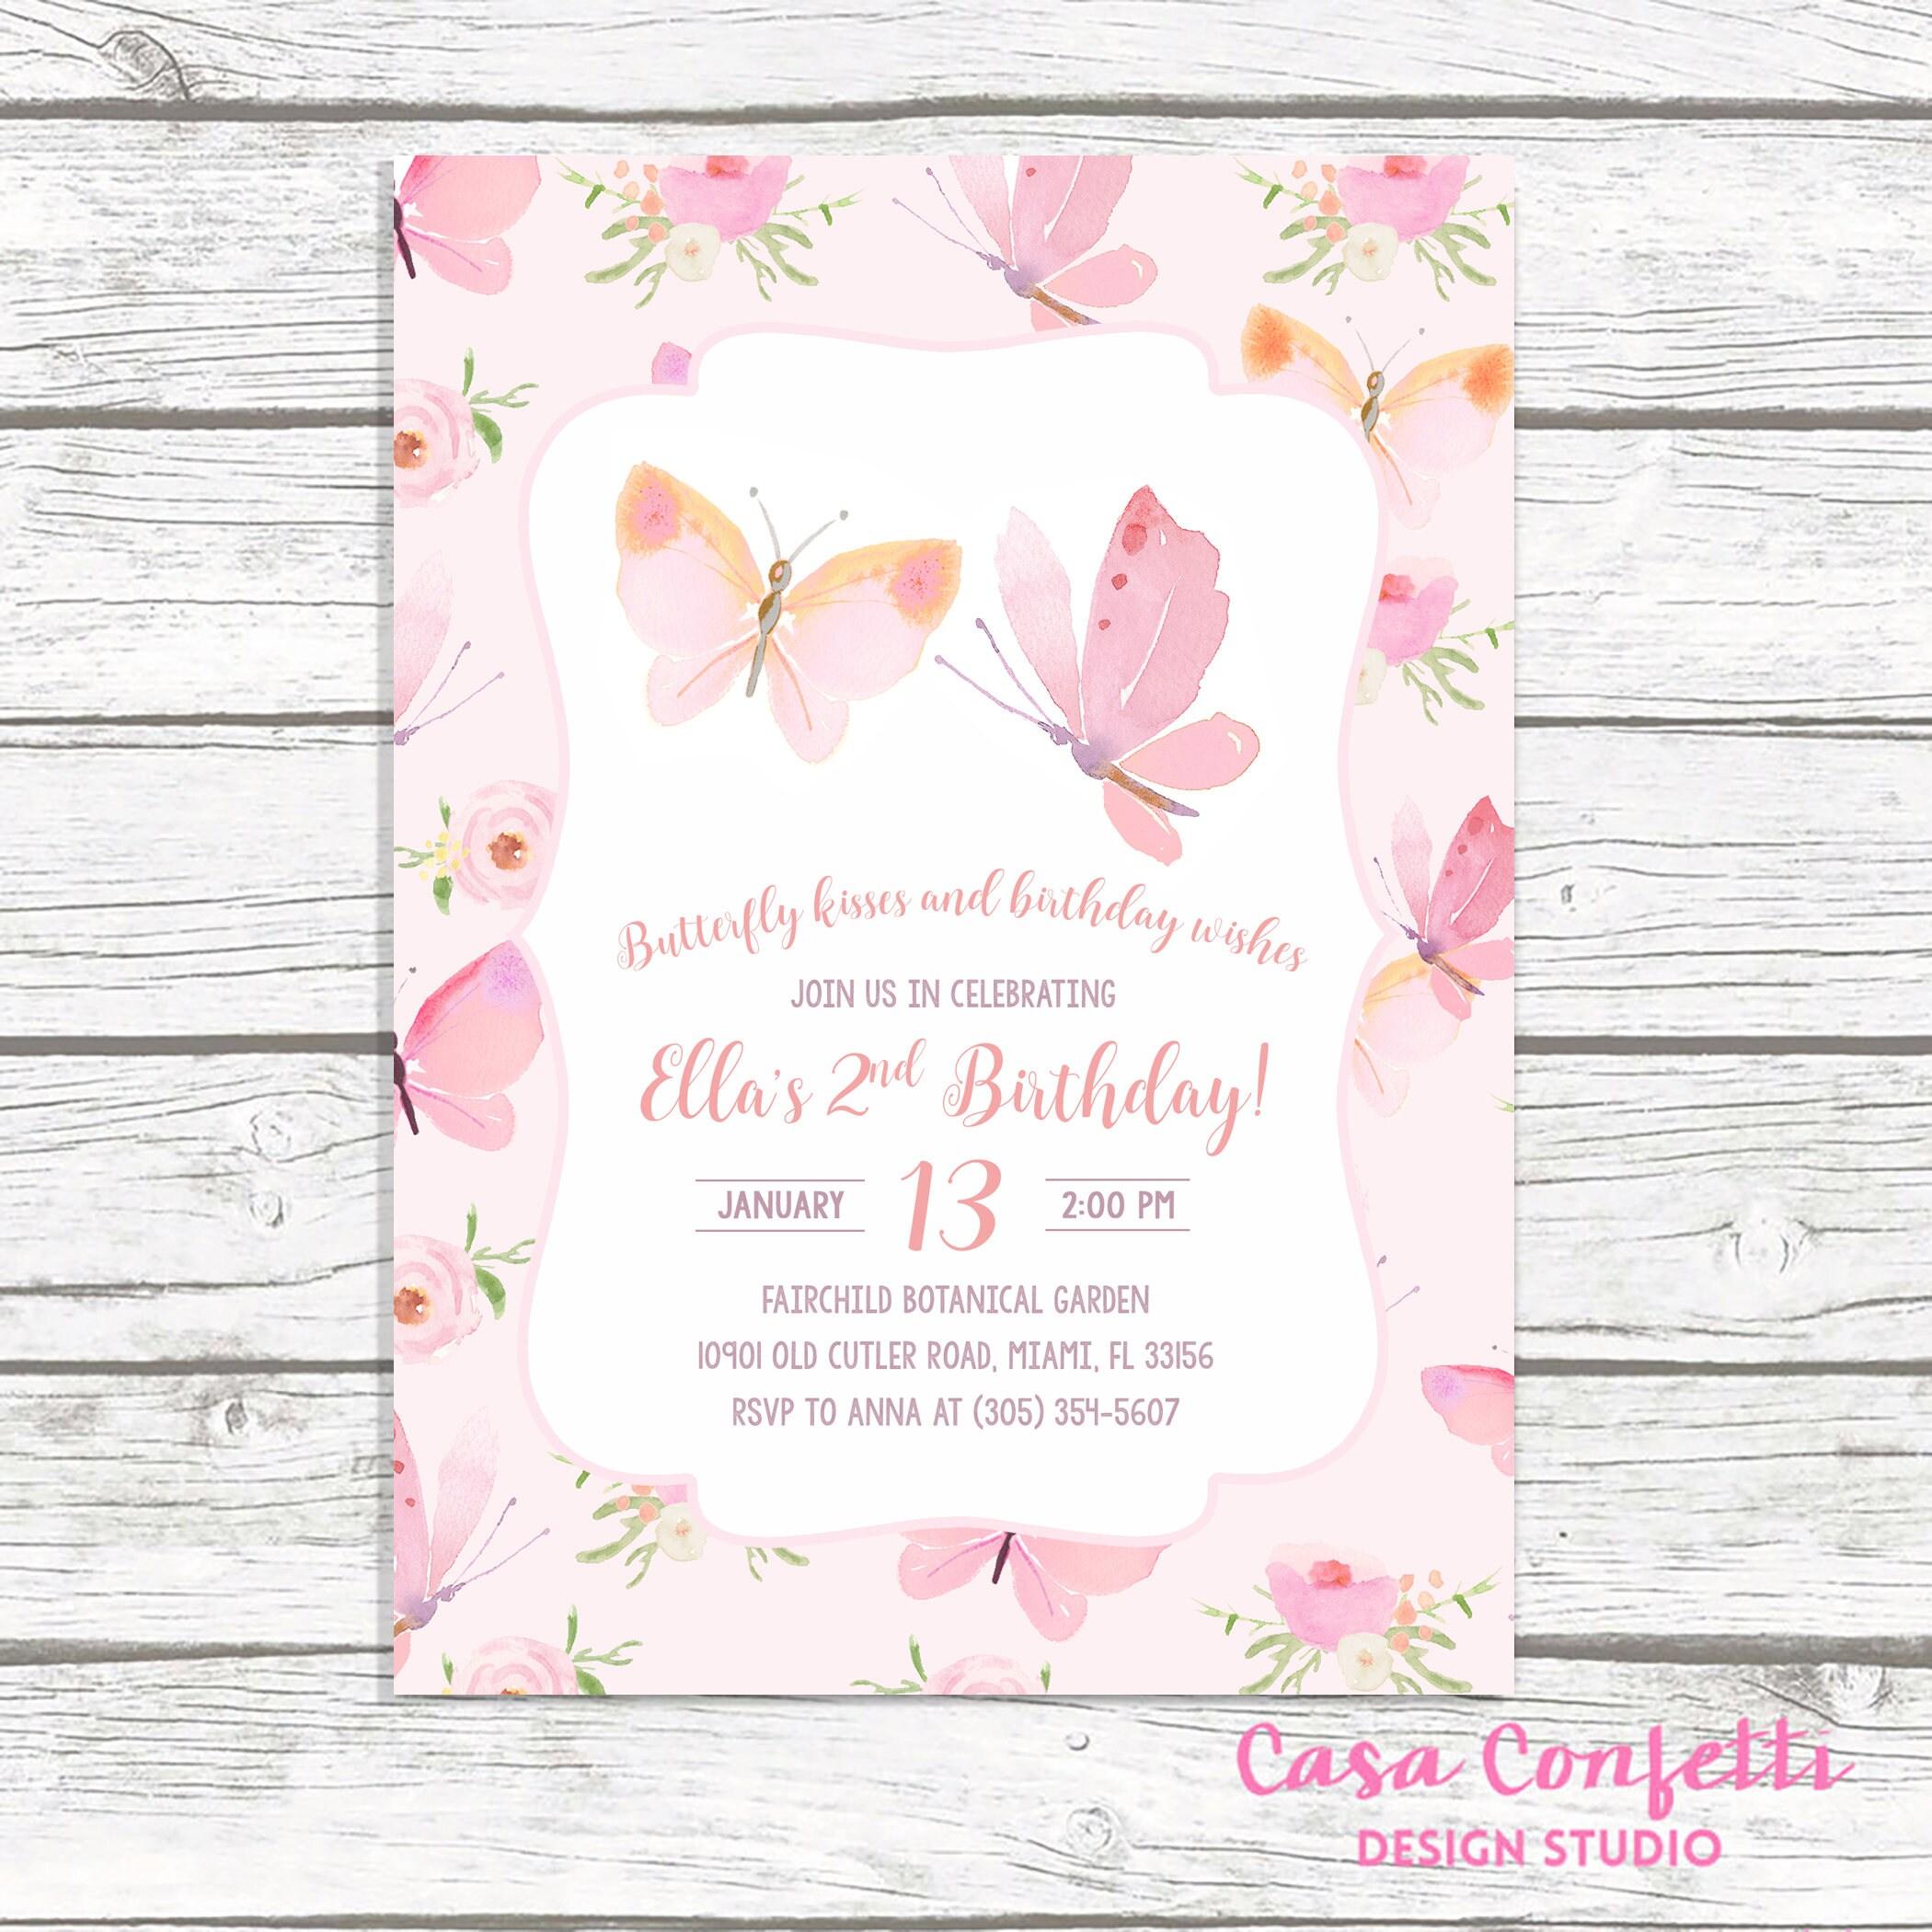 Butterfly Birthday Invitation, Butterfly Invitation, Pink